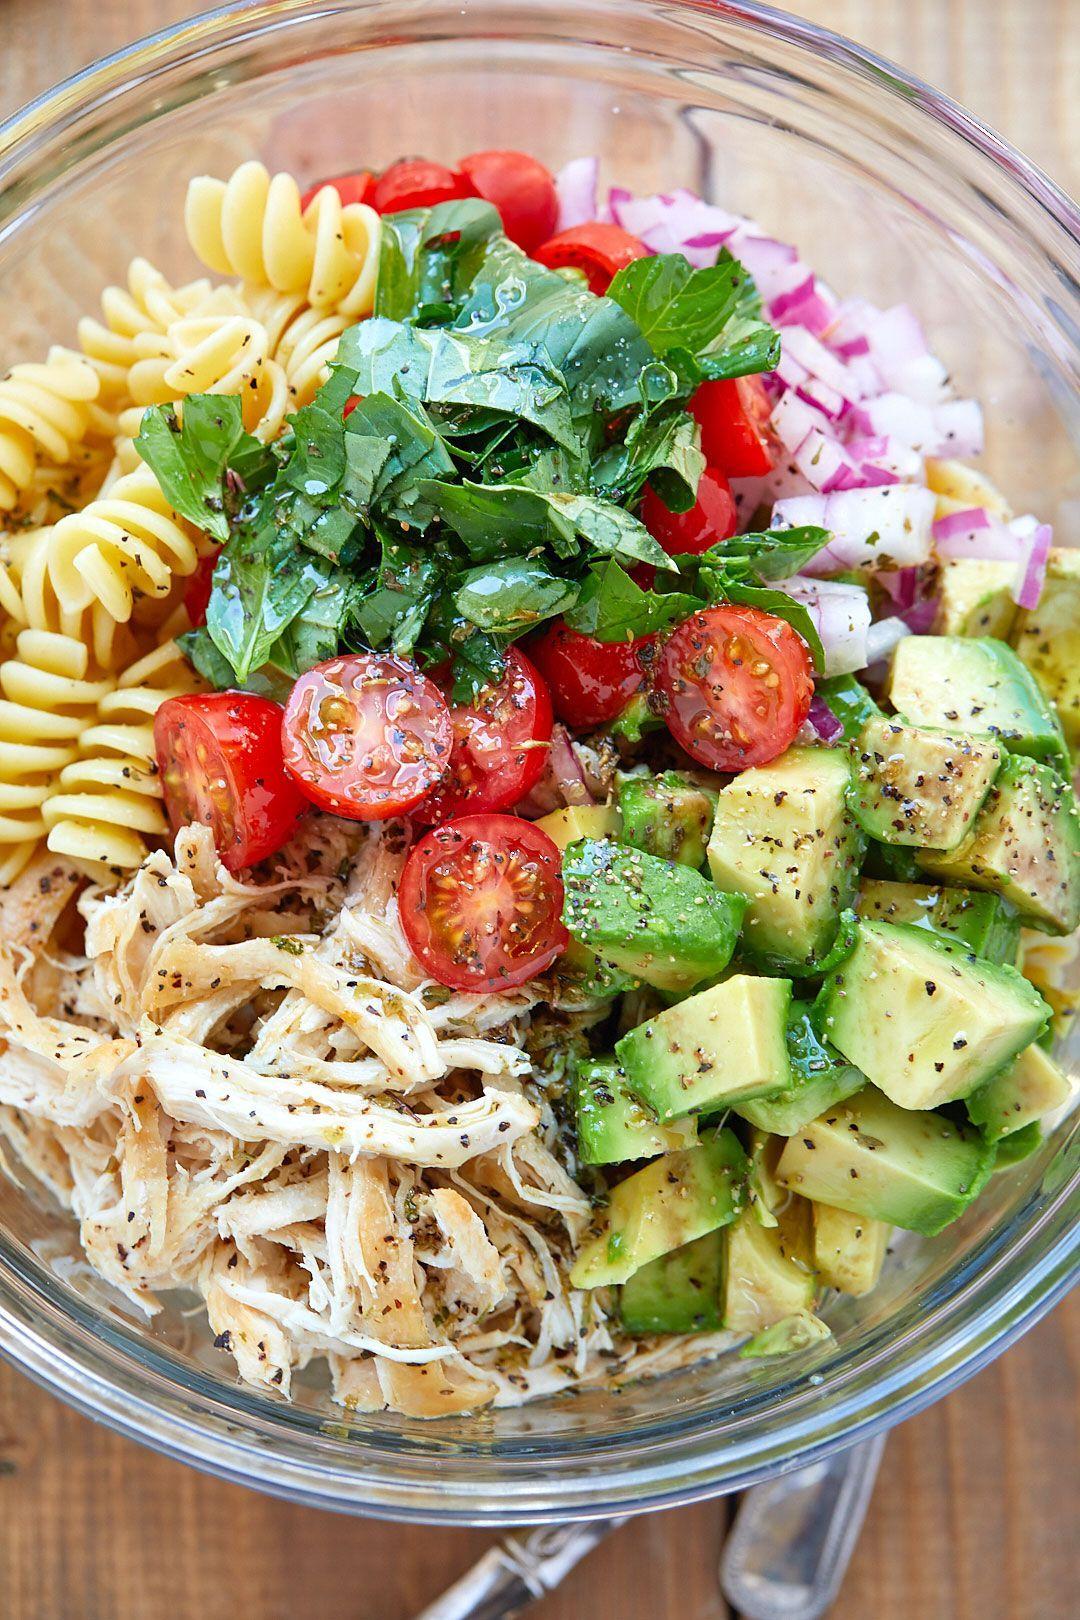 Gesunder Hühnernudelsalat mit Avocado, Tomate und Basilikum - New Ideas #healthyeating